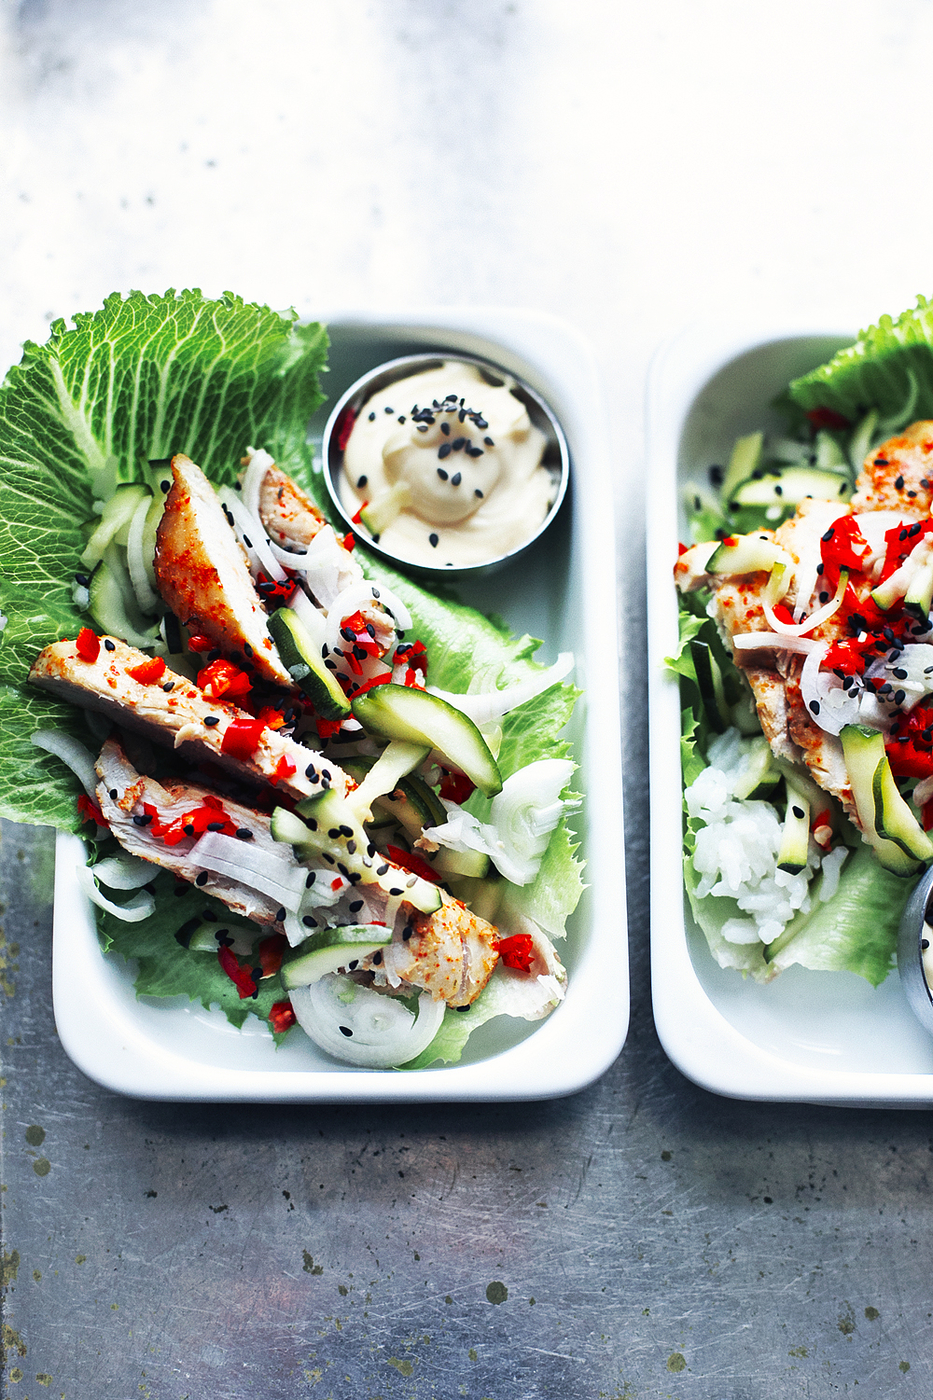 Koreatyyliset salaattiwrapit / Korean salad wraps